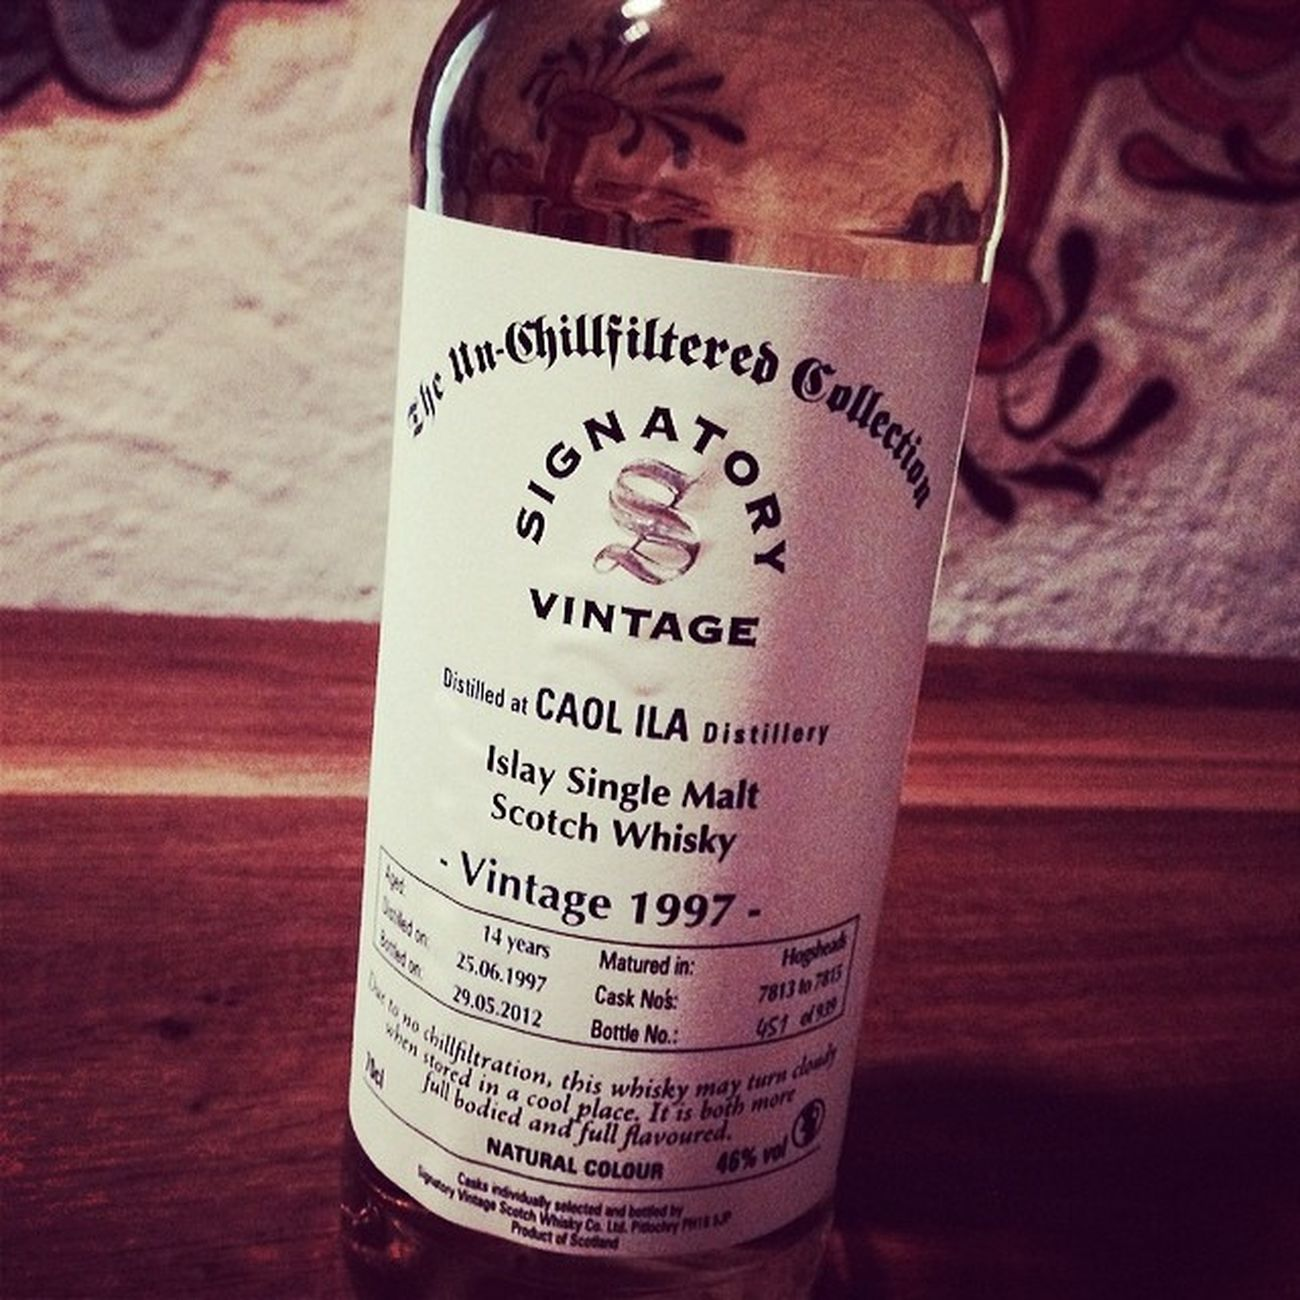 Nr. 7: Signatory Vintage, Caol Ila 1997 14 Jahre... #whiskySBH #tasteup Schottland Singlemalt Tasteup Vintage Whiskysbh Whisky Caolila Islay Whiskyporn Scotch Unchillfiltered Malt 14jahre Slàinte 14years 1997 Signatory Immendingen Brennerhof Tuttlingen Scottland